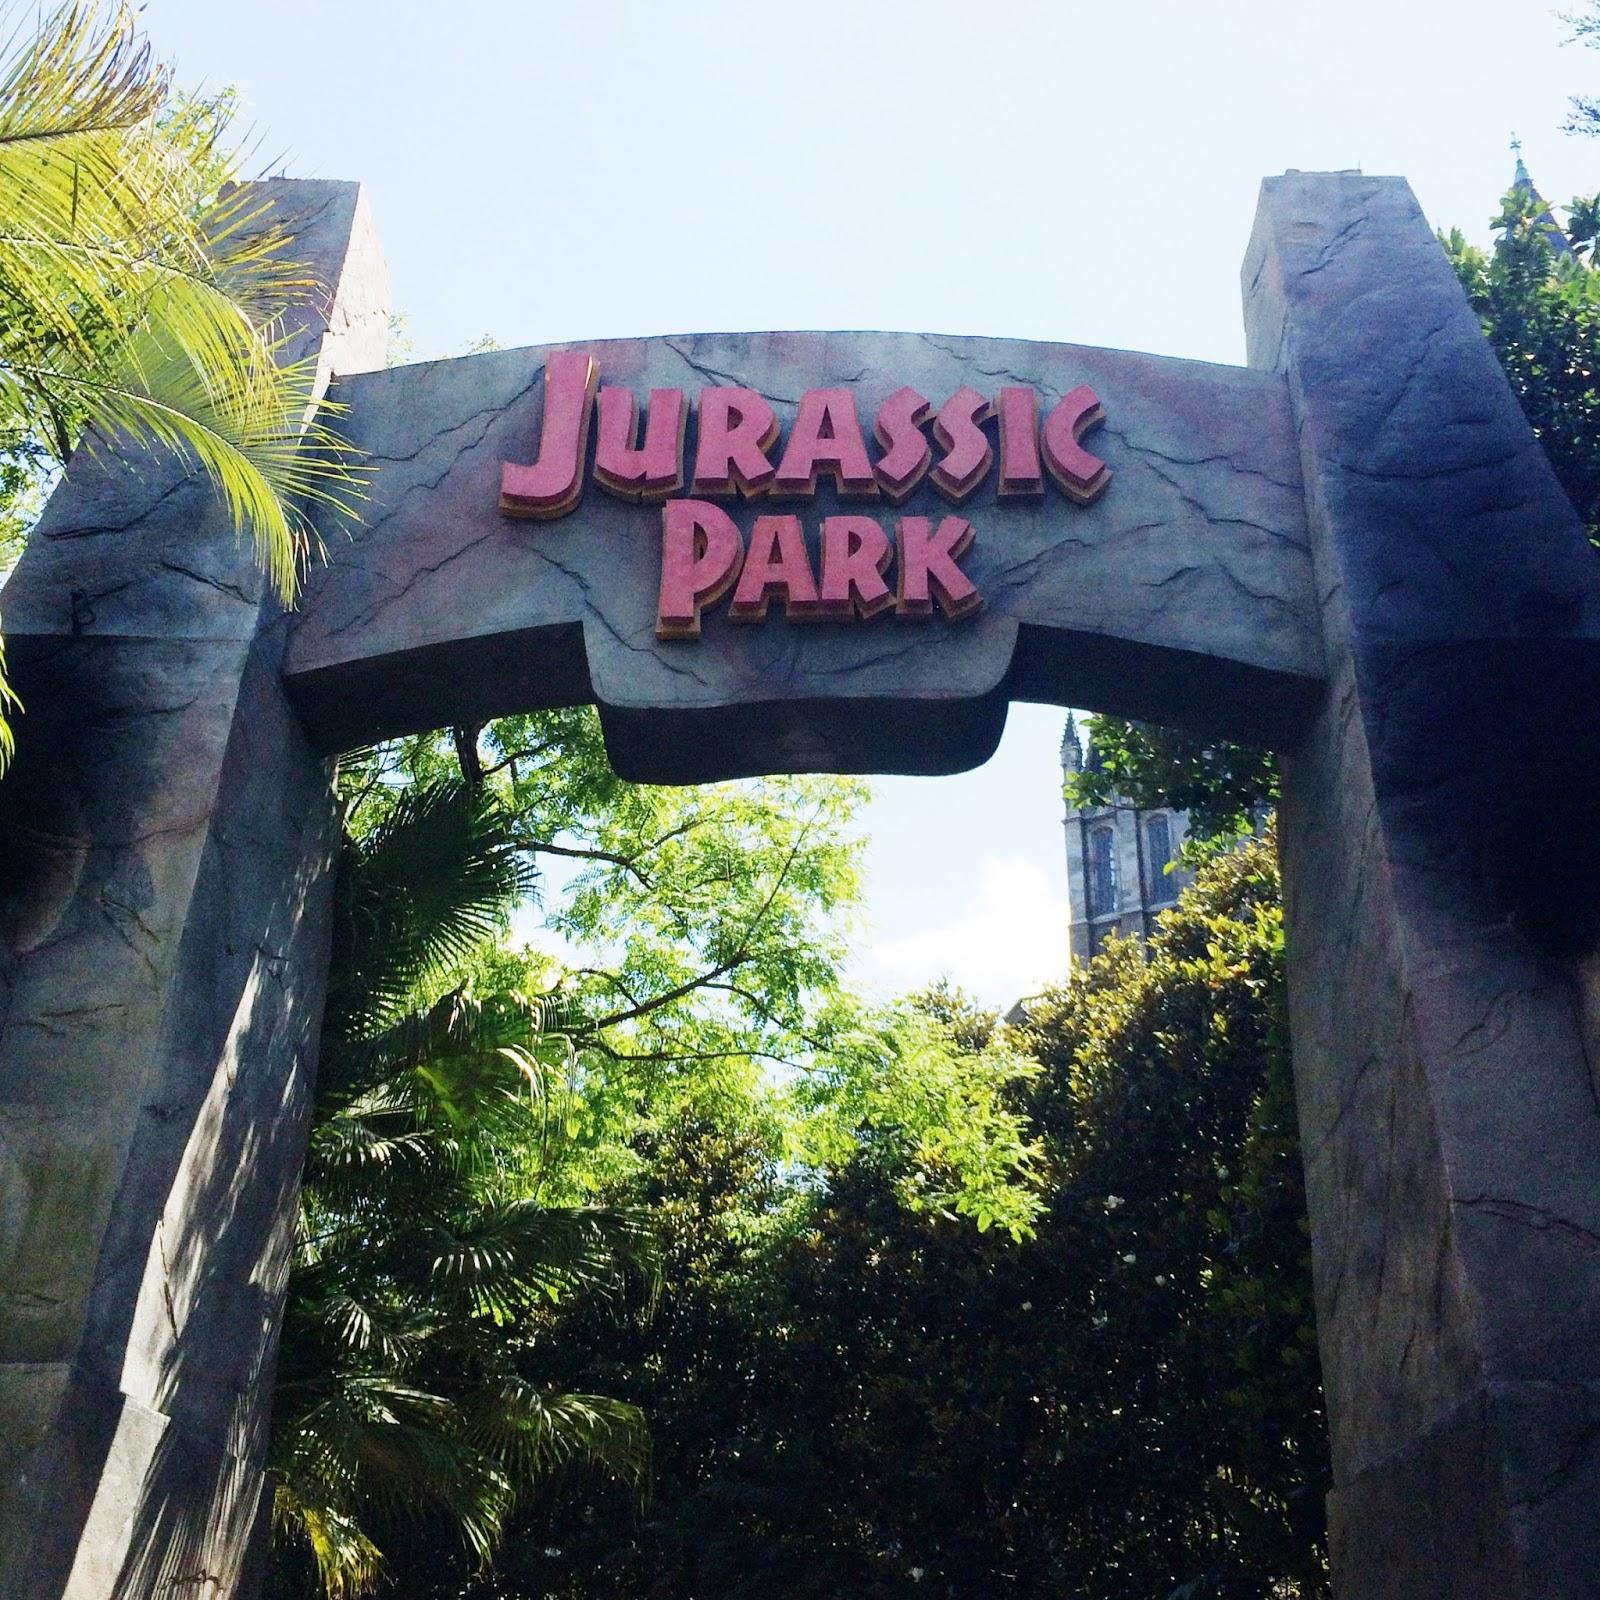 Jurassic Park, Orlando